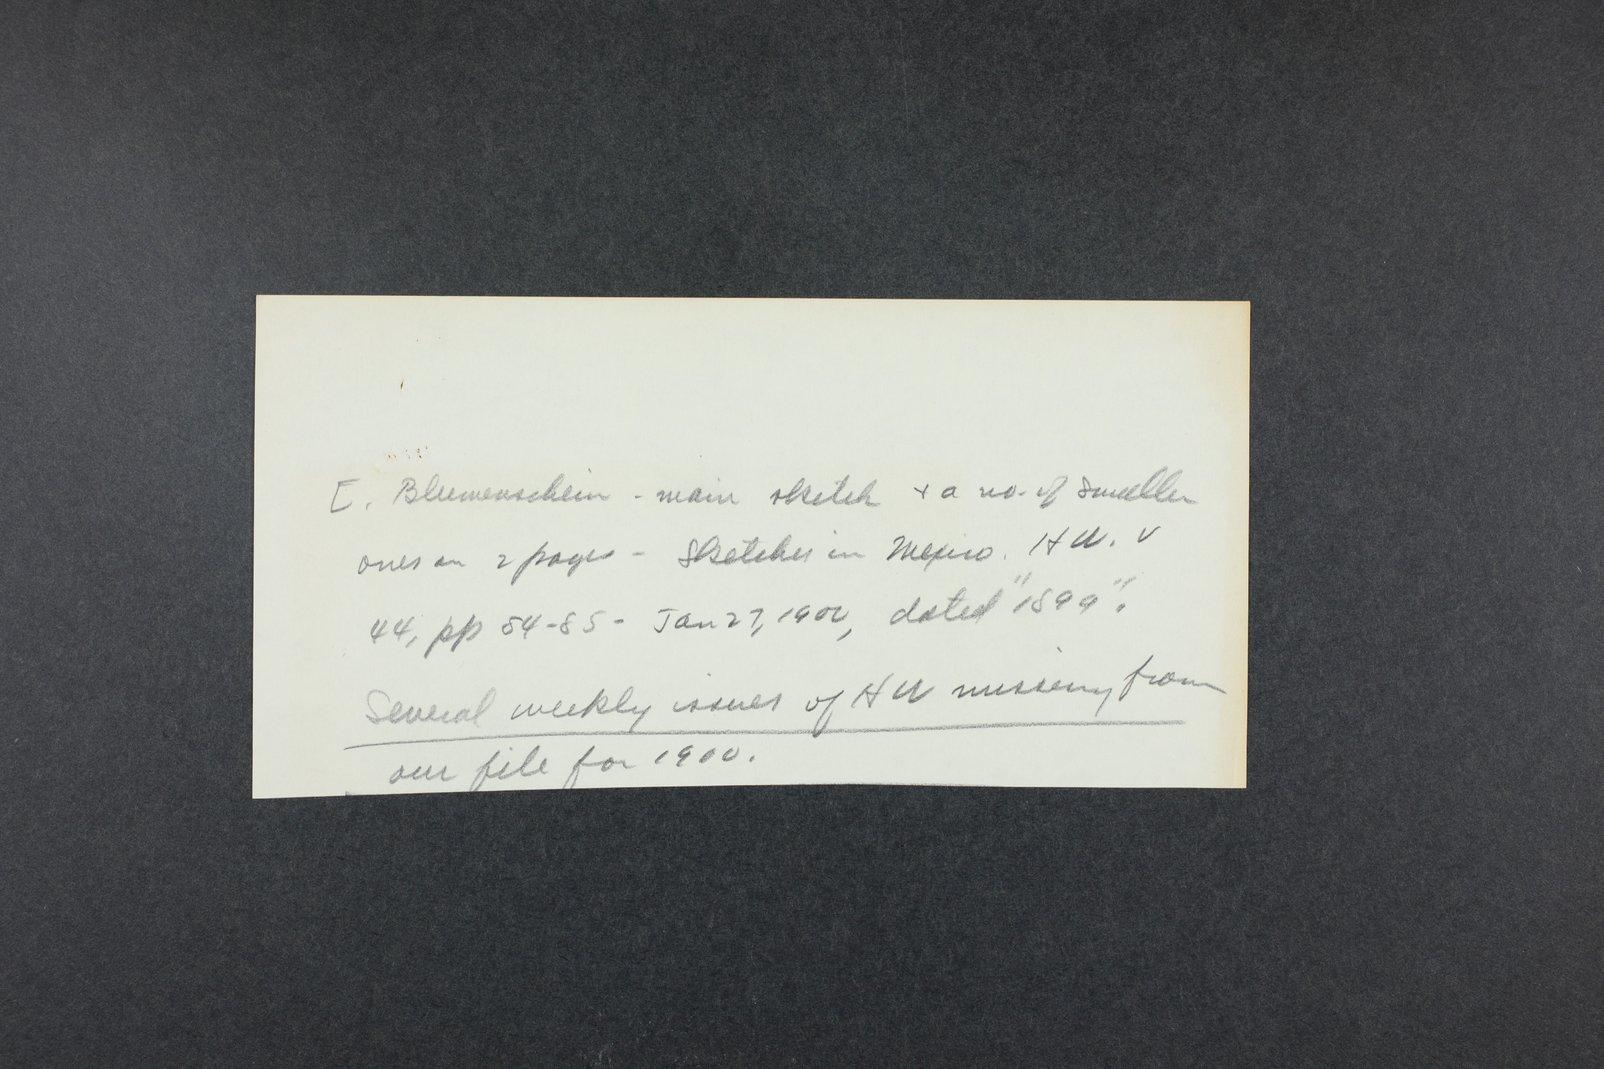 Robert Taft correspondence related to frontier artists, Blumenshein - Cary - 11